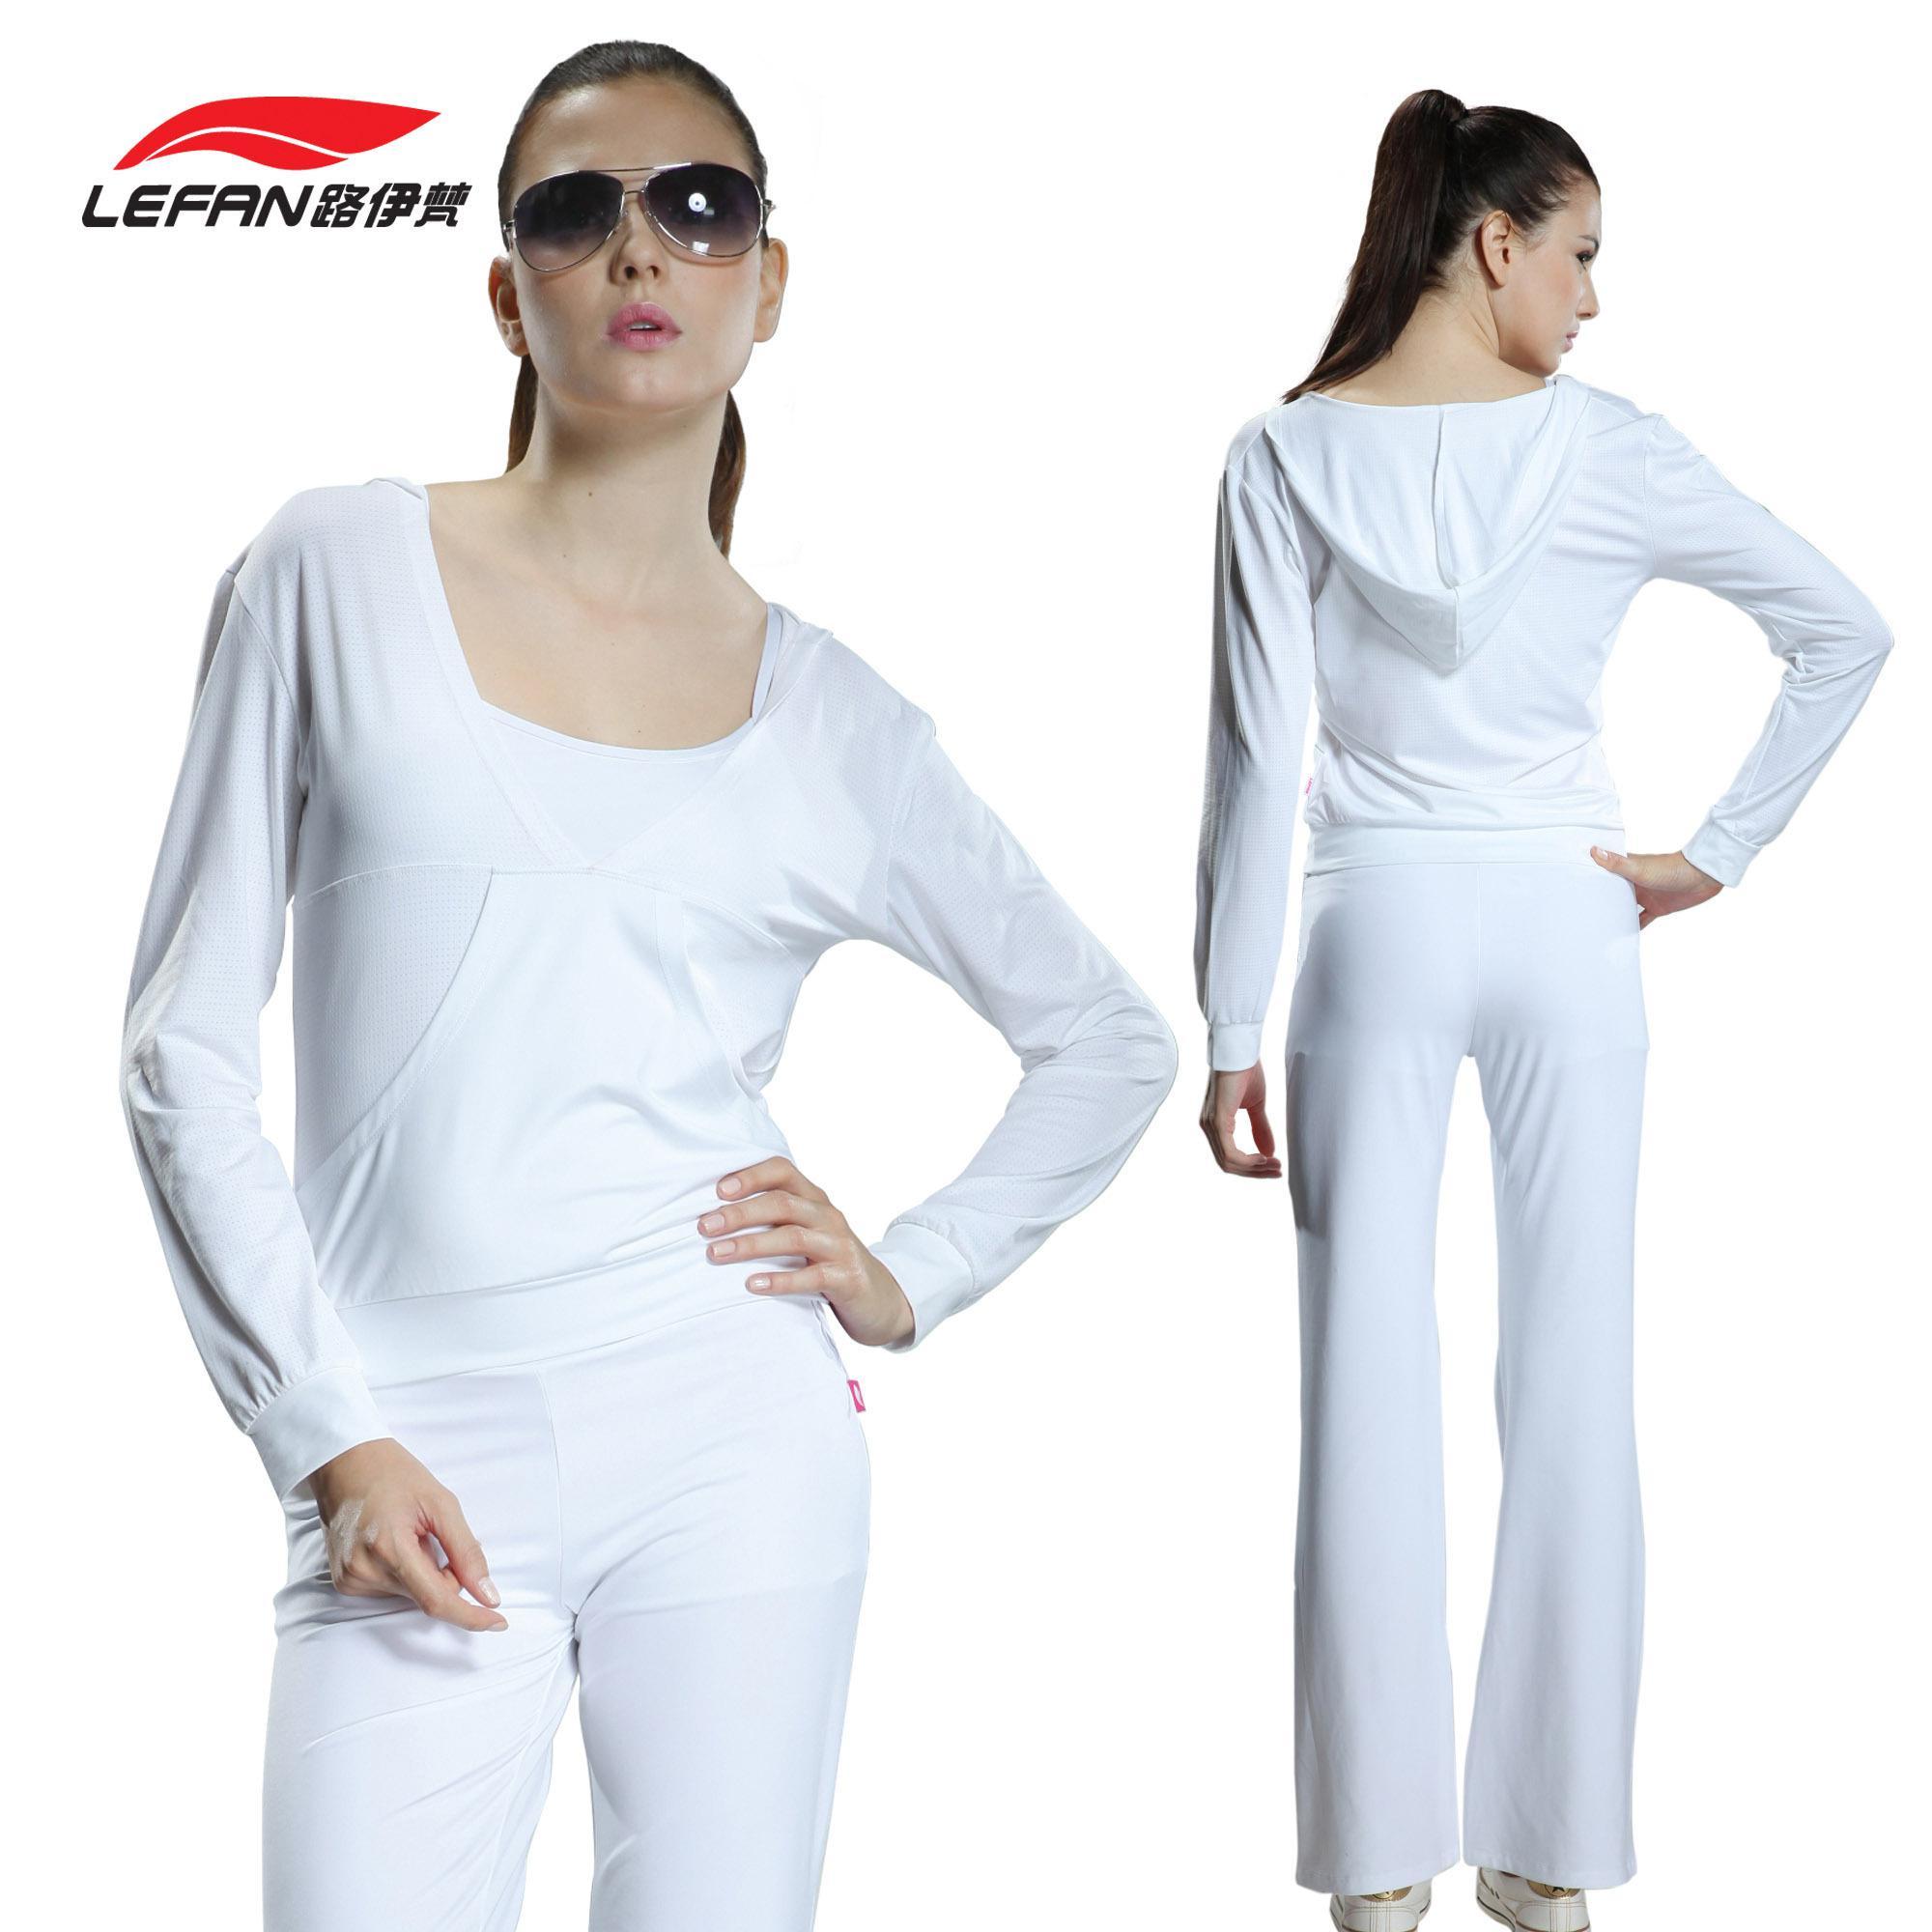 white-yoga-clothes-women-s-sportswear-fitness.jpg